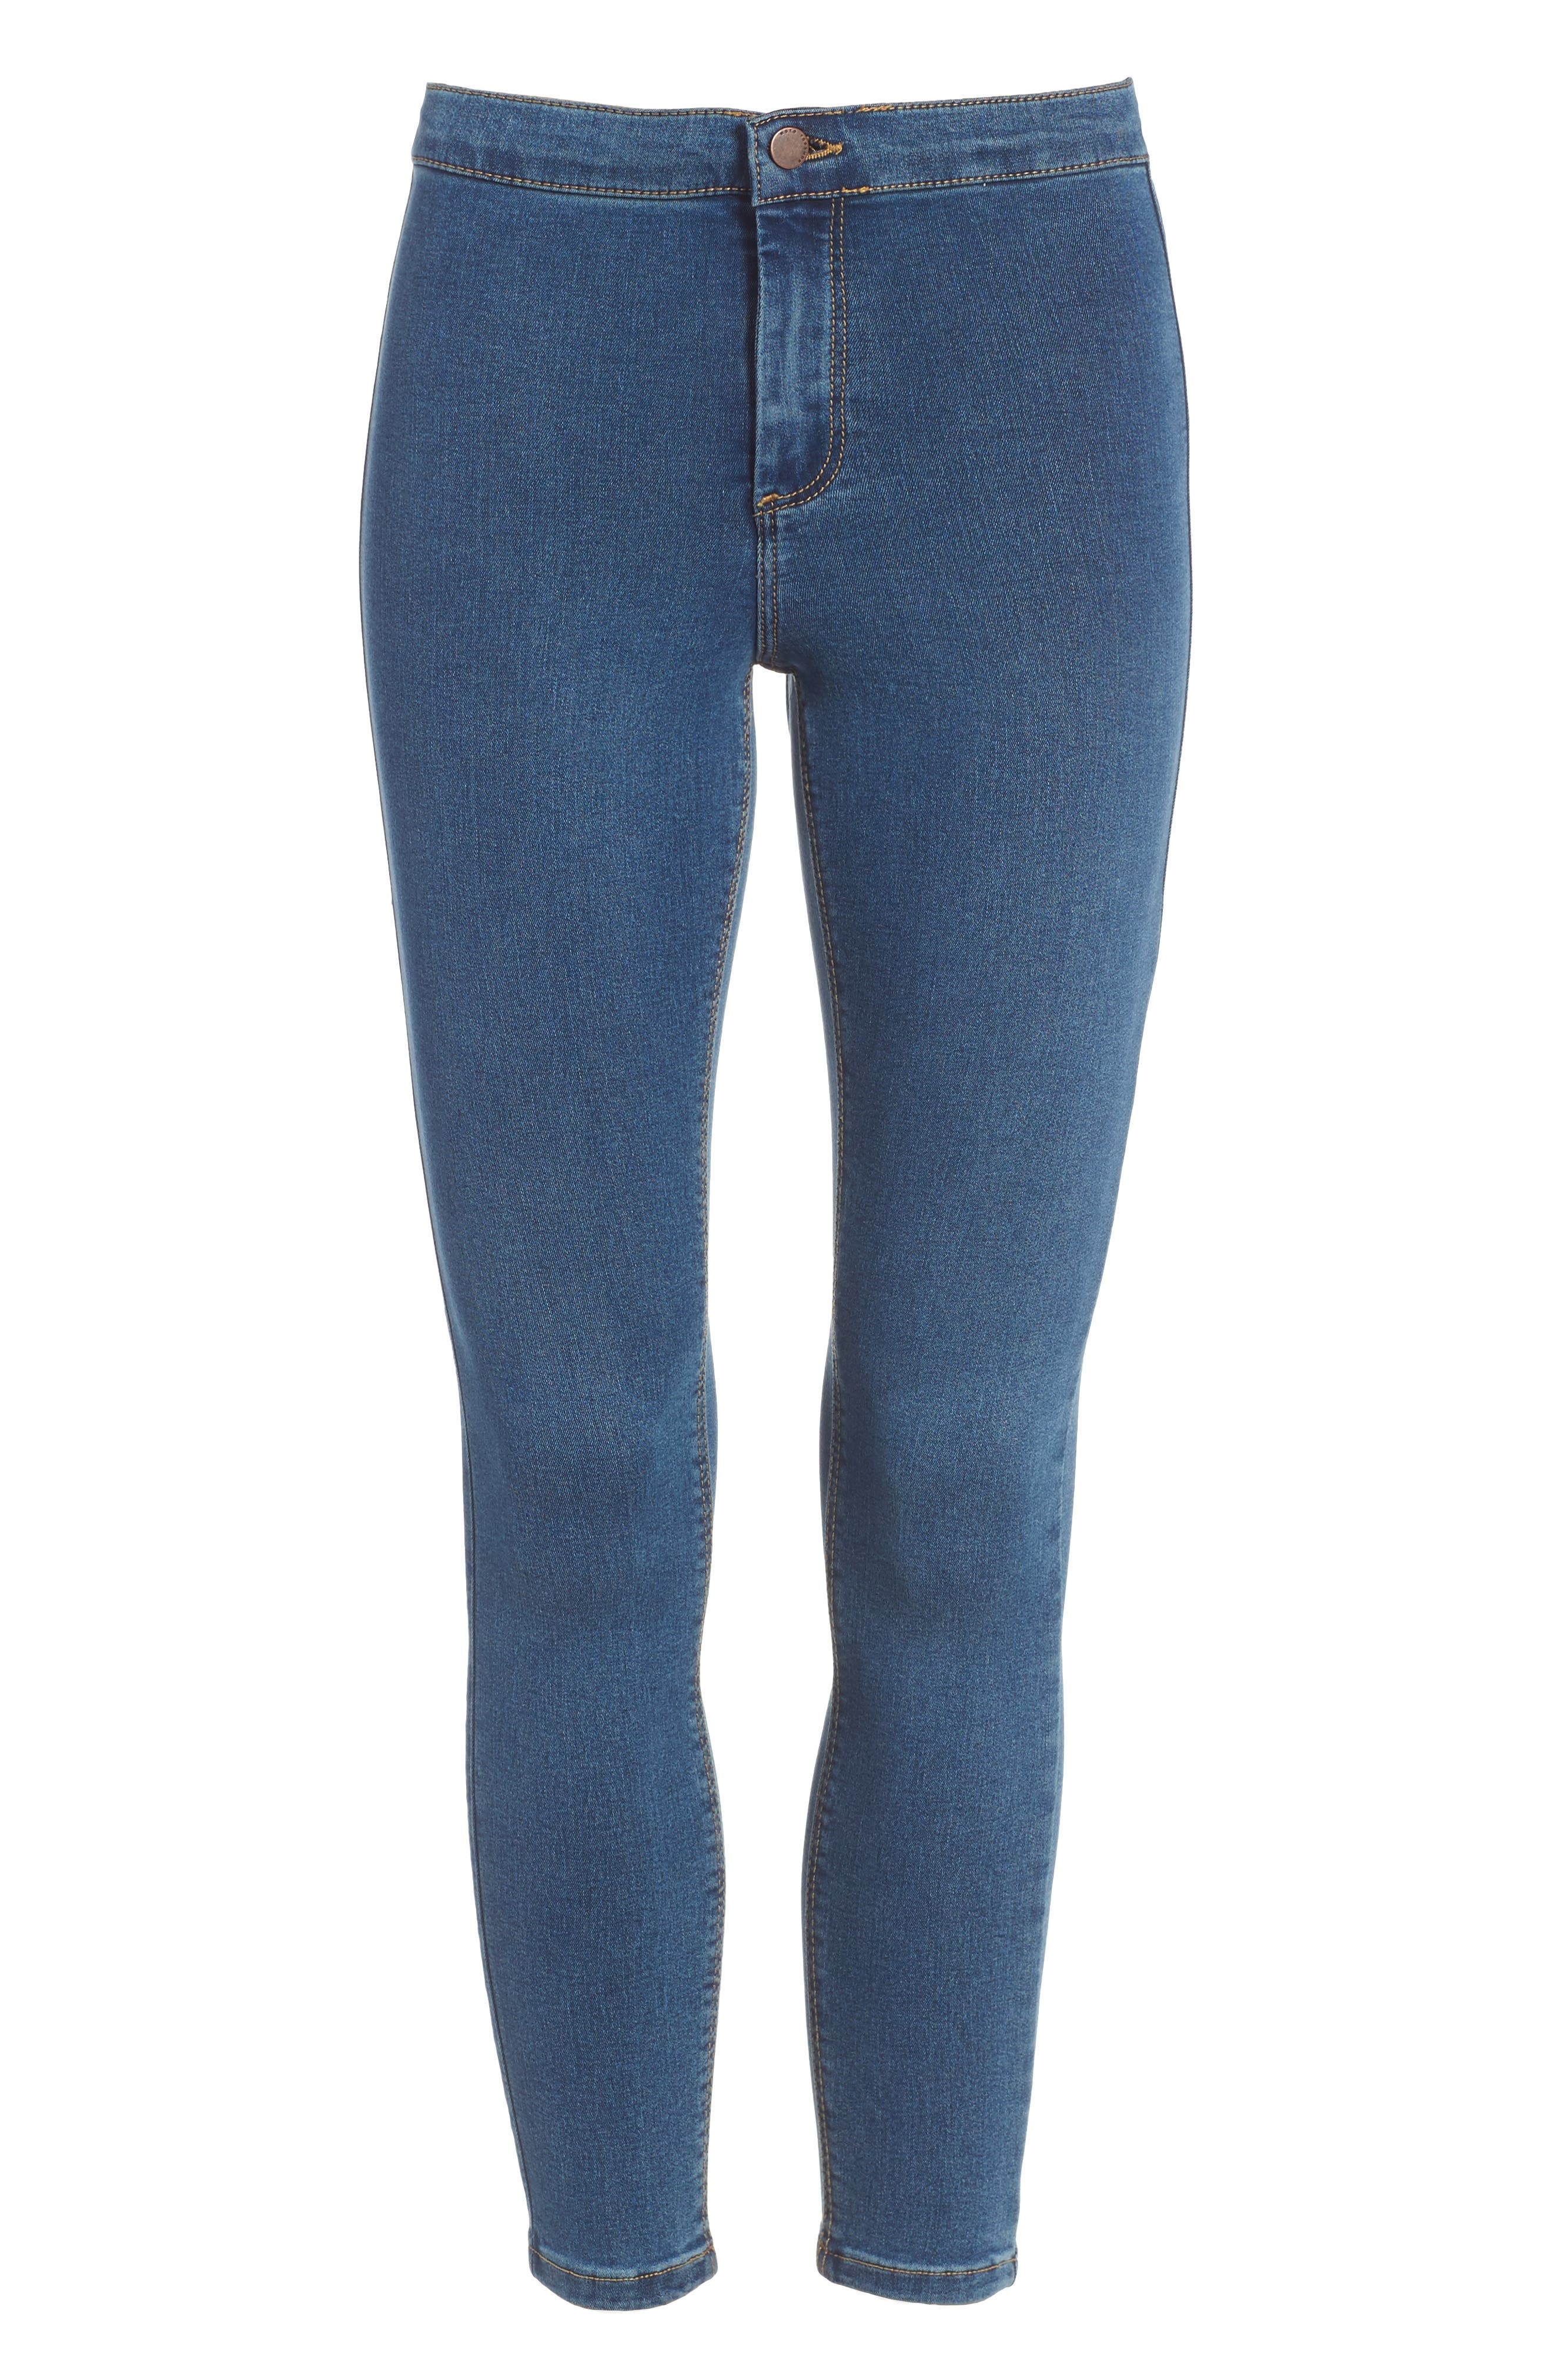 Main Image - Topshop Joni Skinny Jeans (Petite)